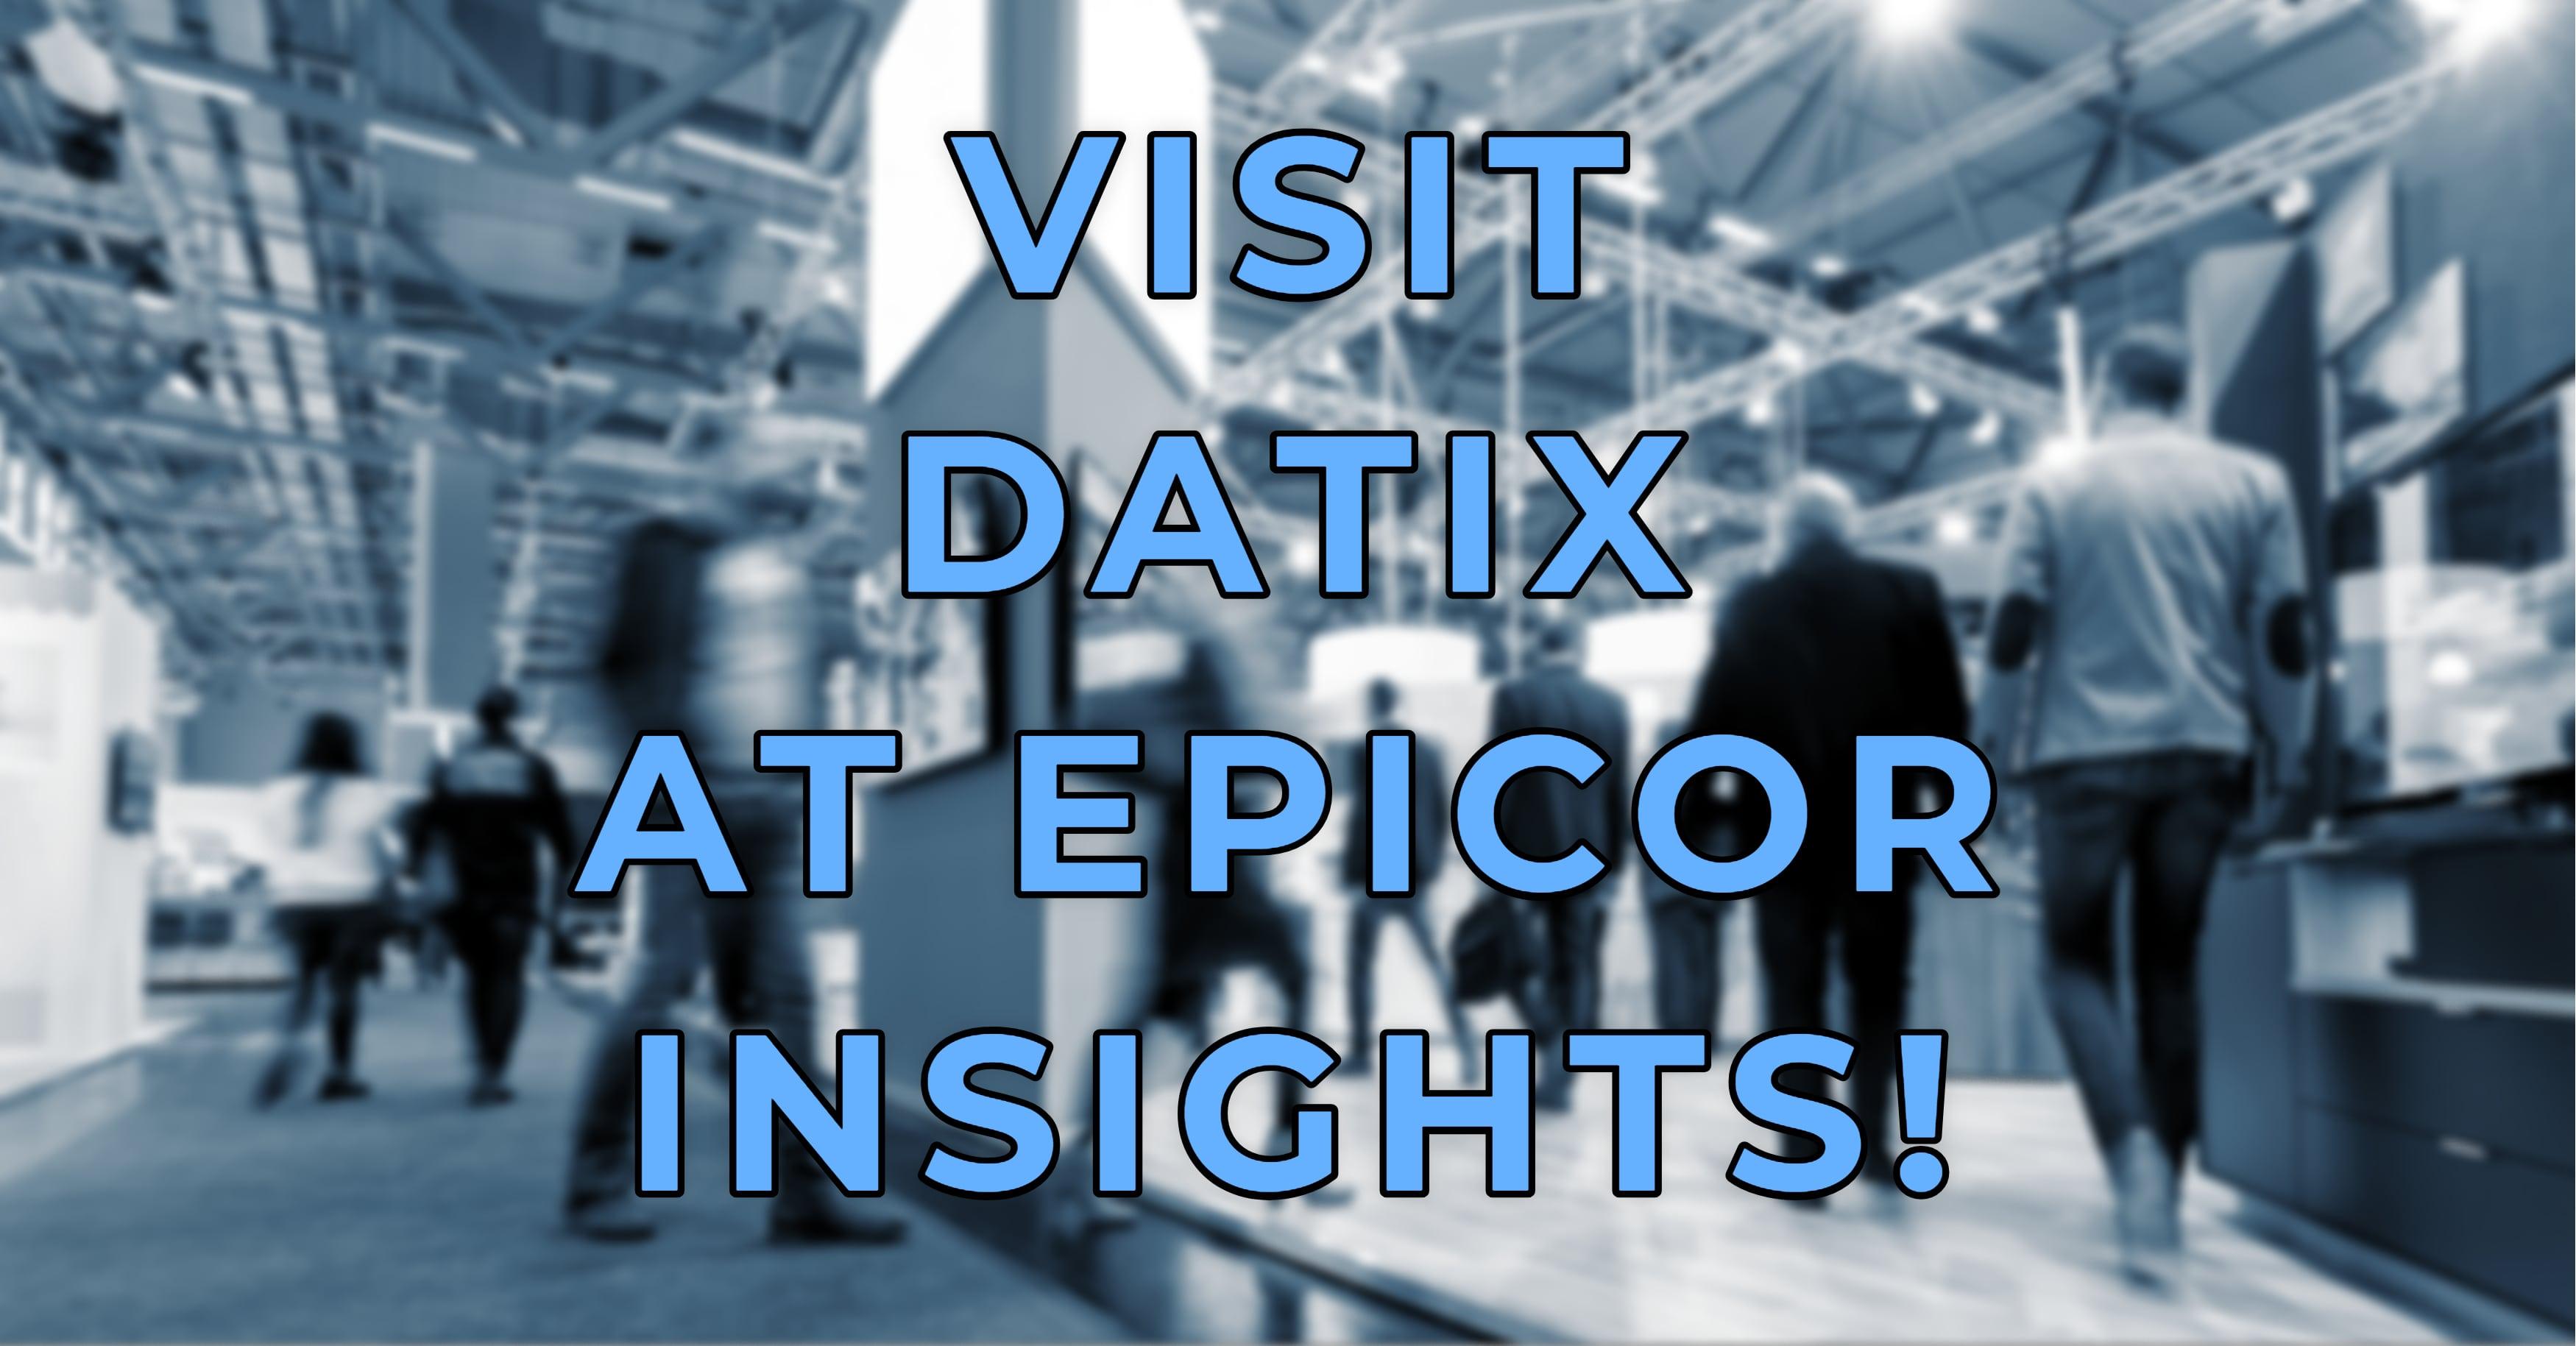 Datix Epicor Insights 2018